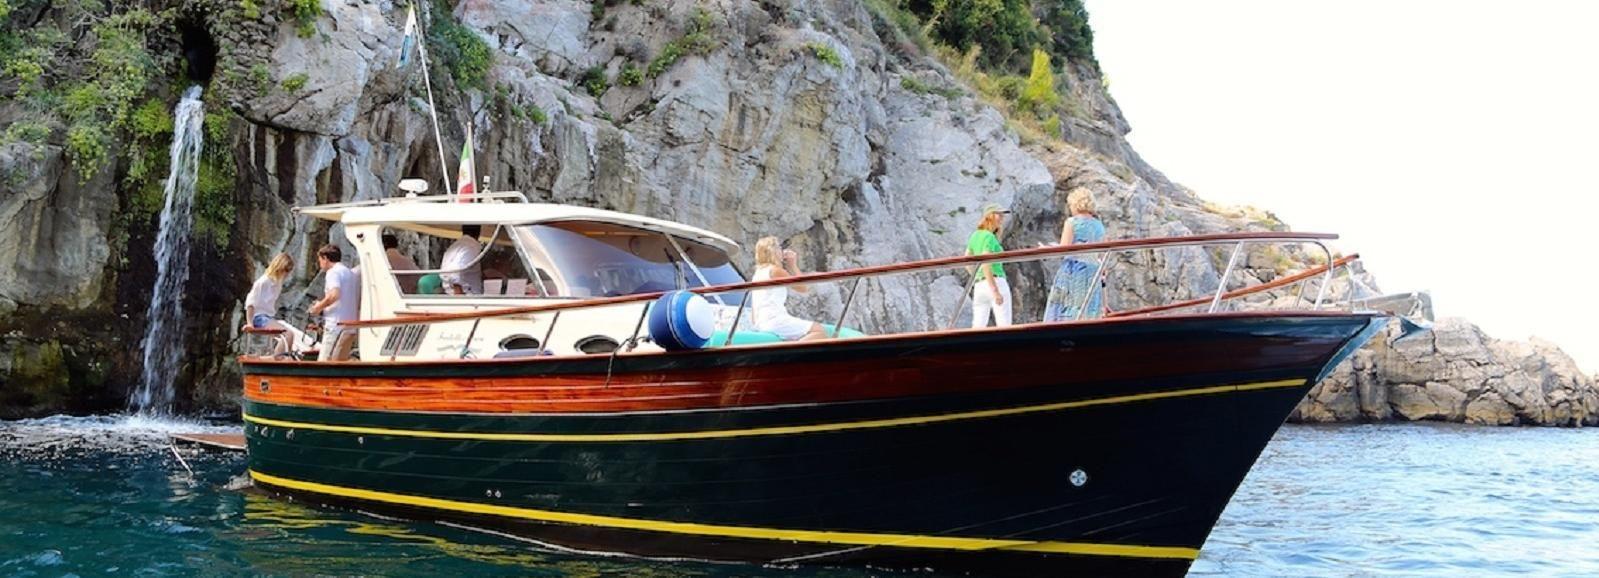 Positano et Amalfi en bateau